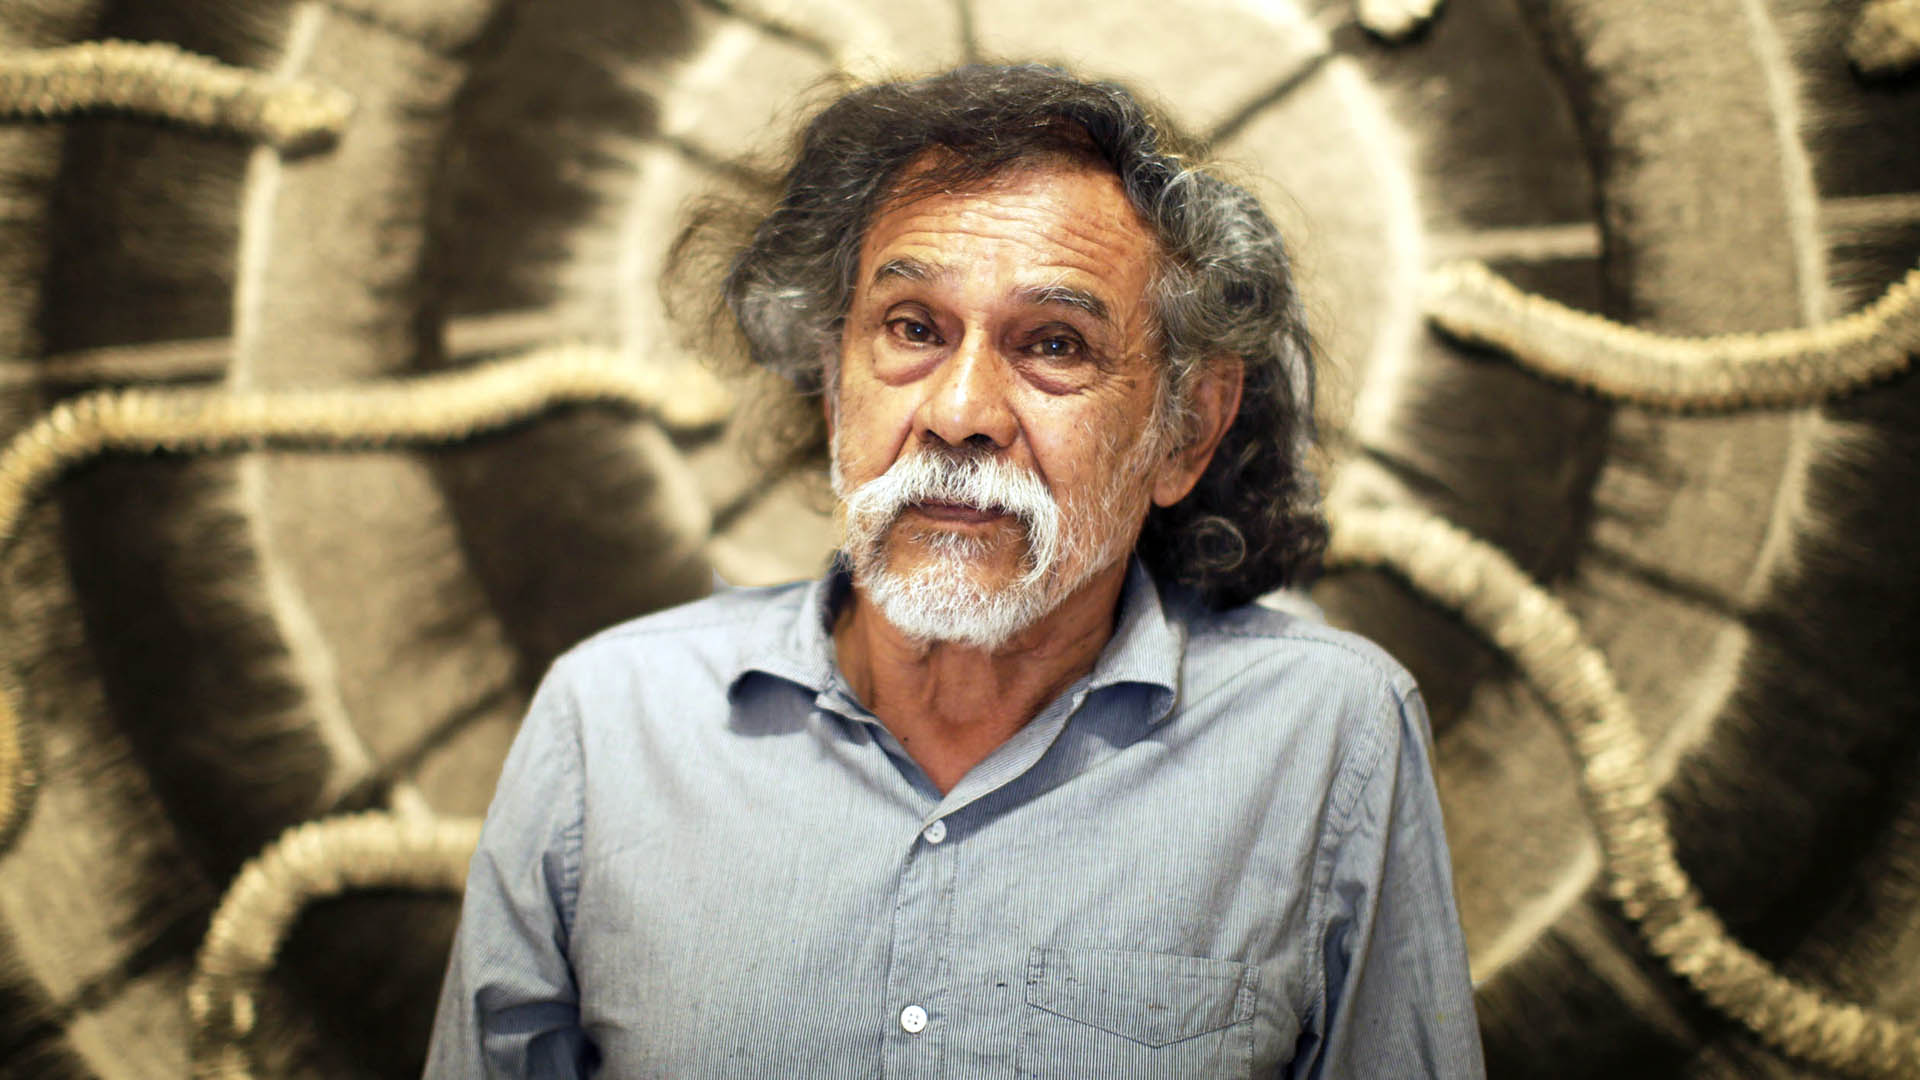 Fallece Francisco Toledo, un gigante del arte en México